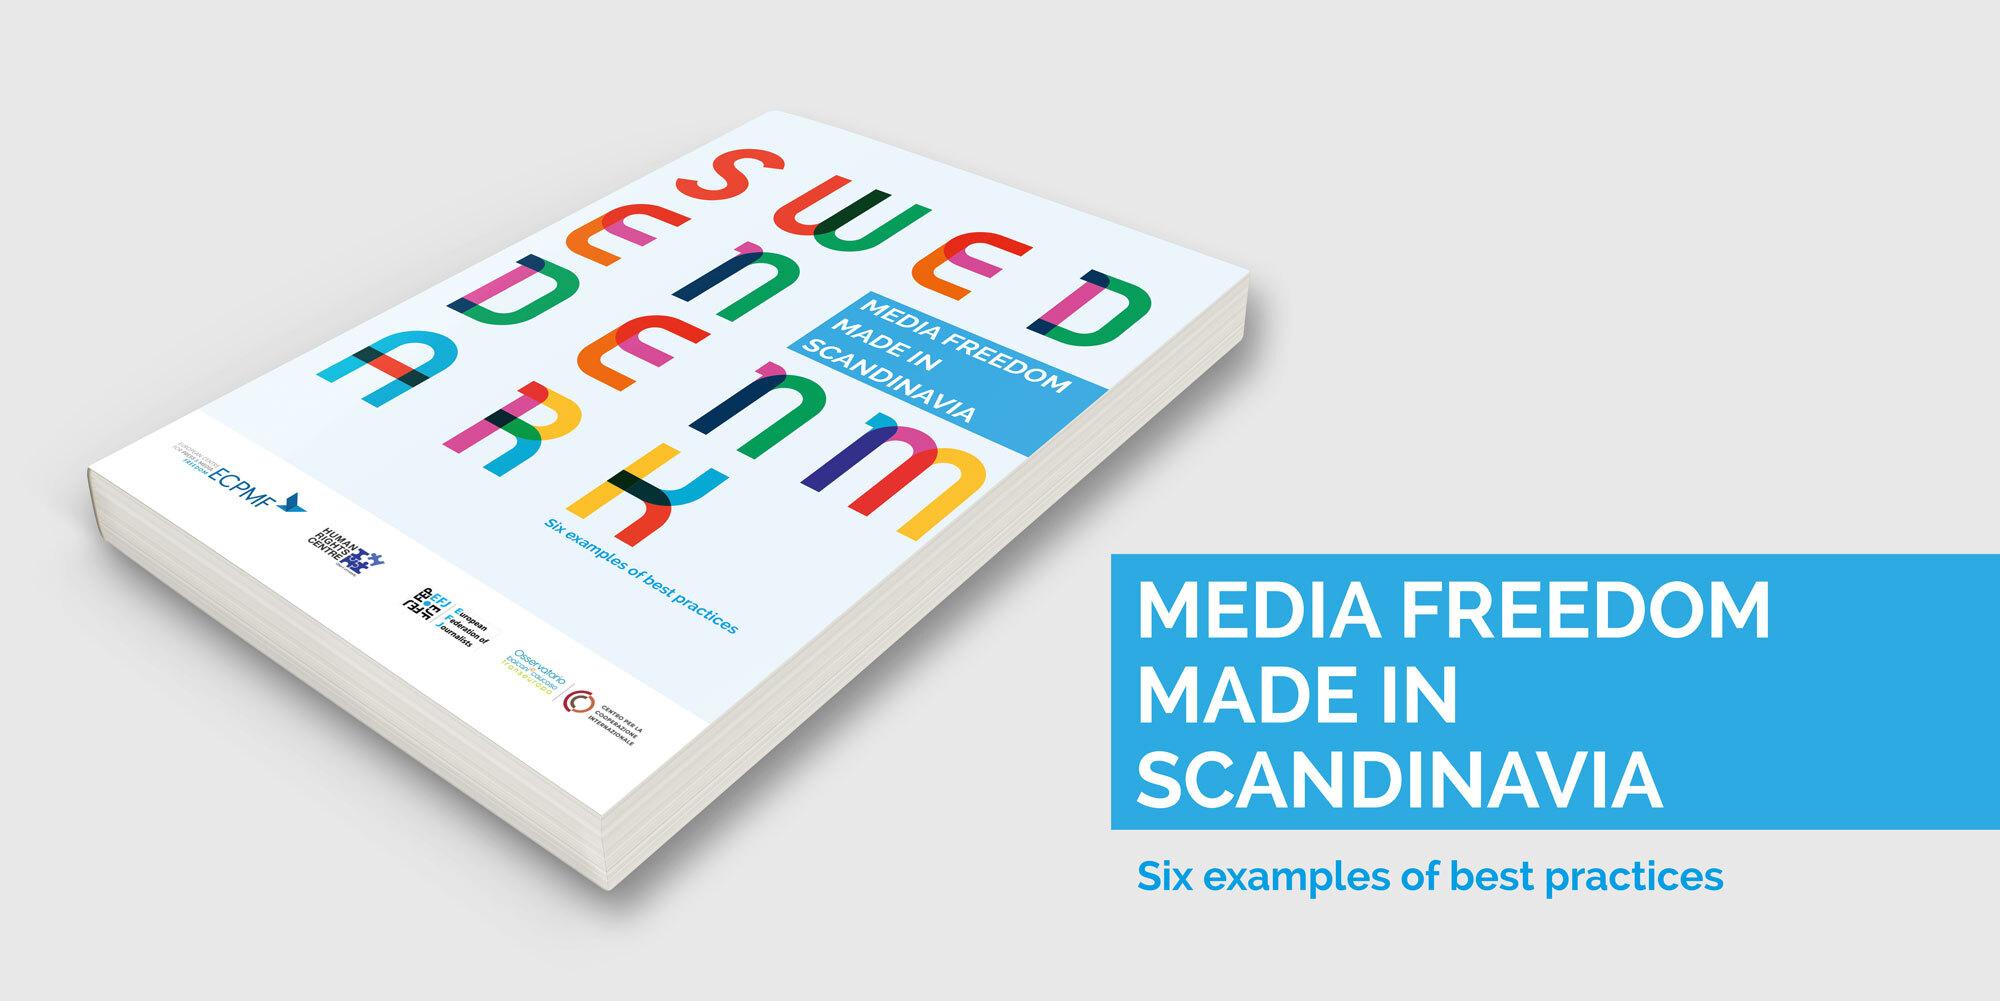 Sweden; Denmark; Best Practice; Fact-Finding Mission